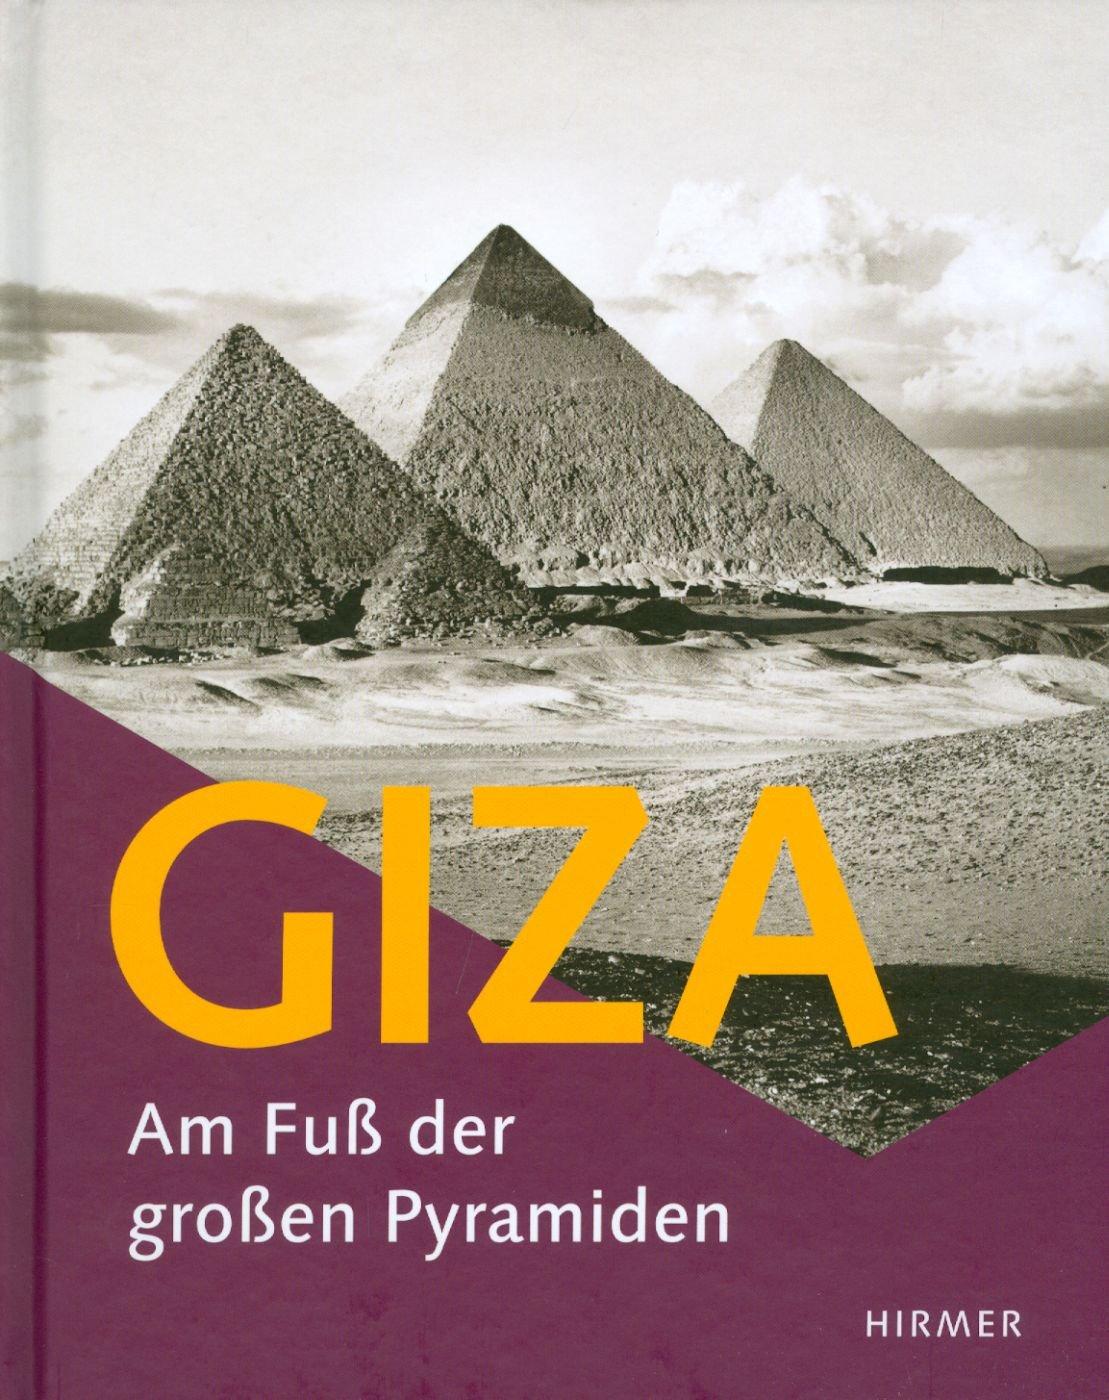 giza-am-fuss-der-grossen-pyramiden-katalog-zur-ausstellung-hildesheim-roemer-pelizaeus-museum-16-04-21-08-2011